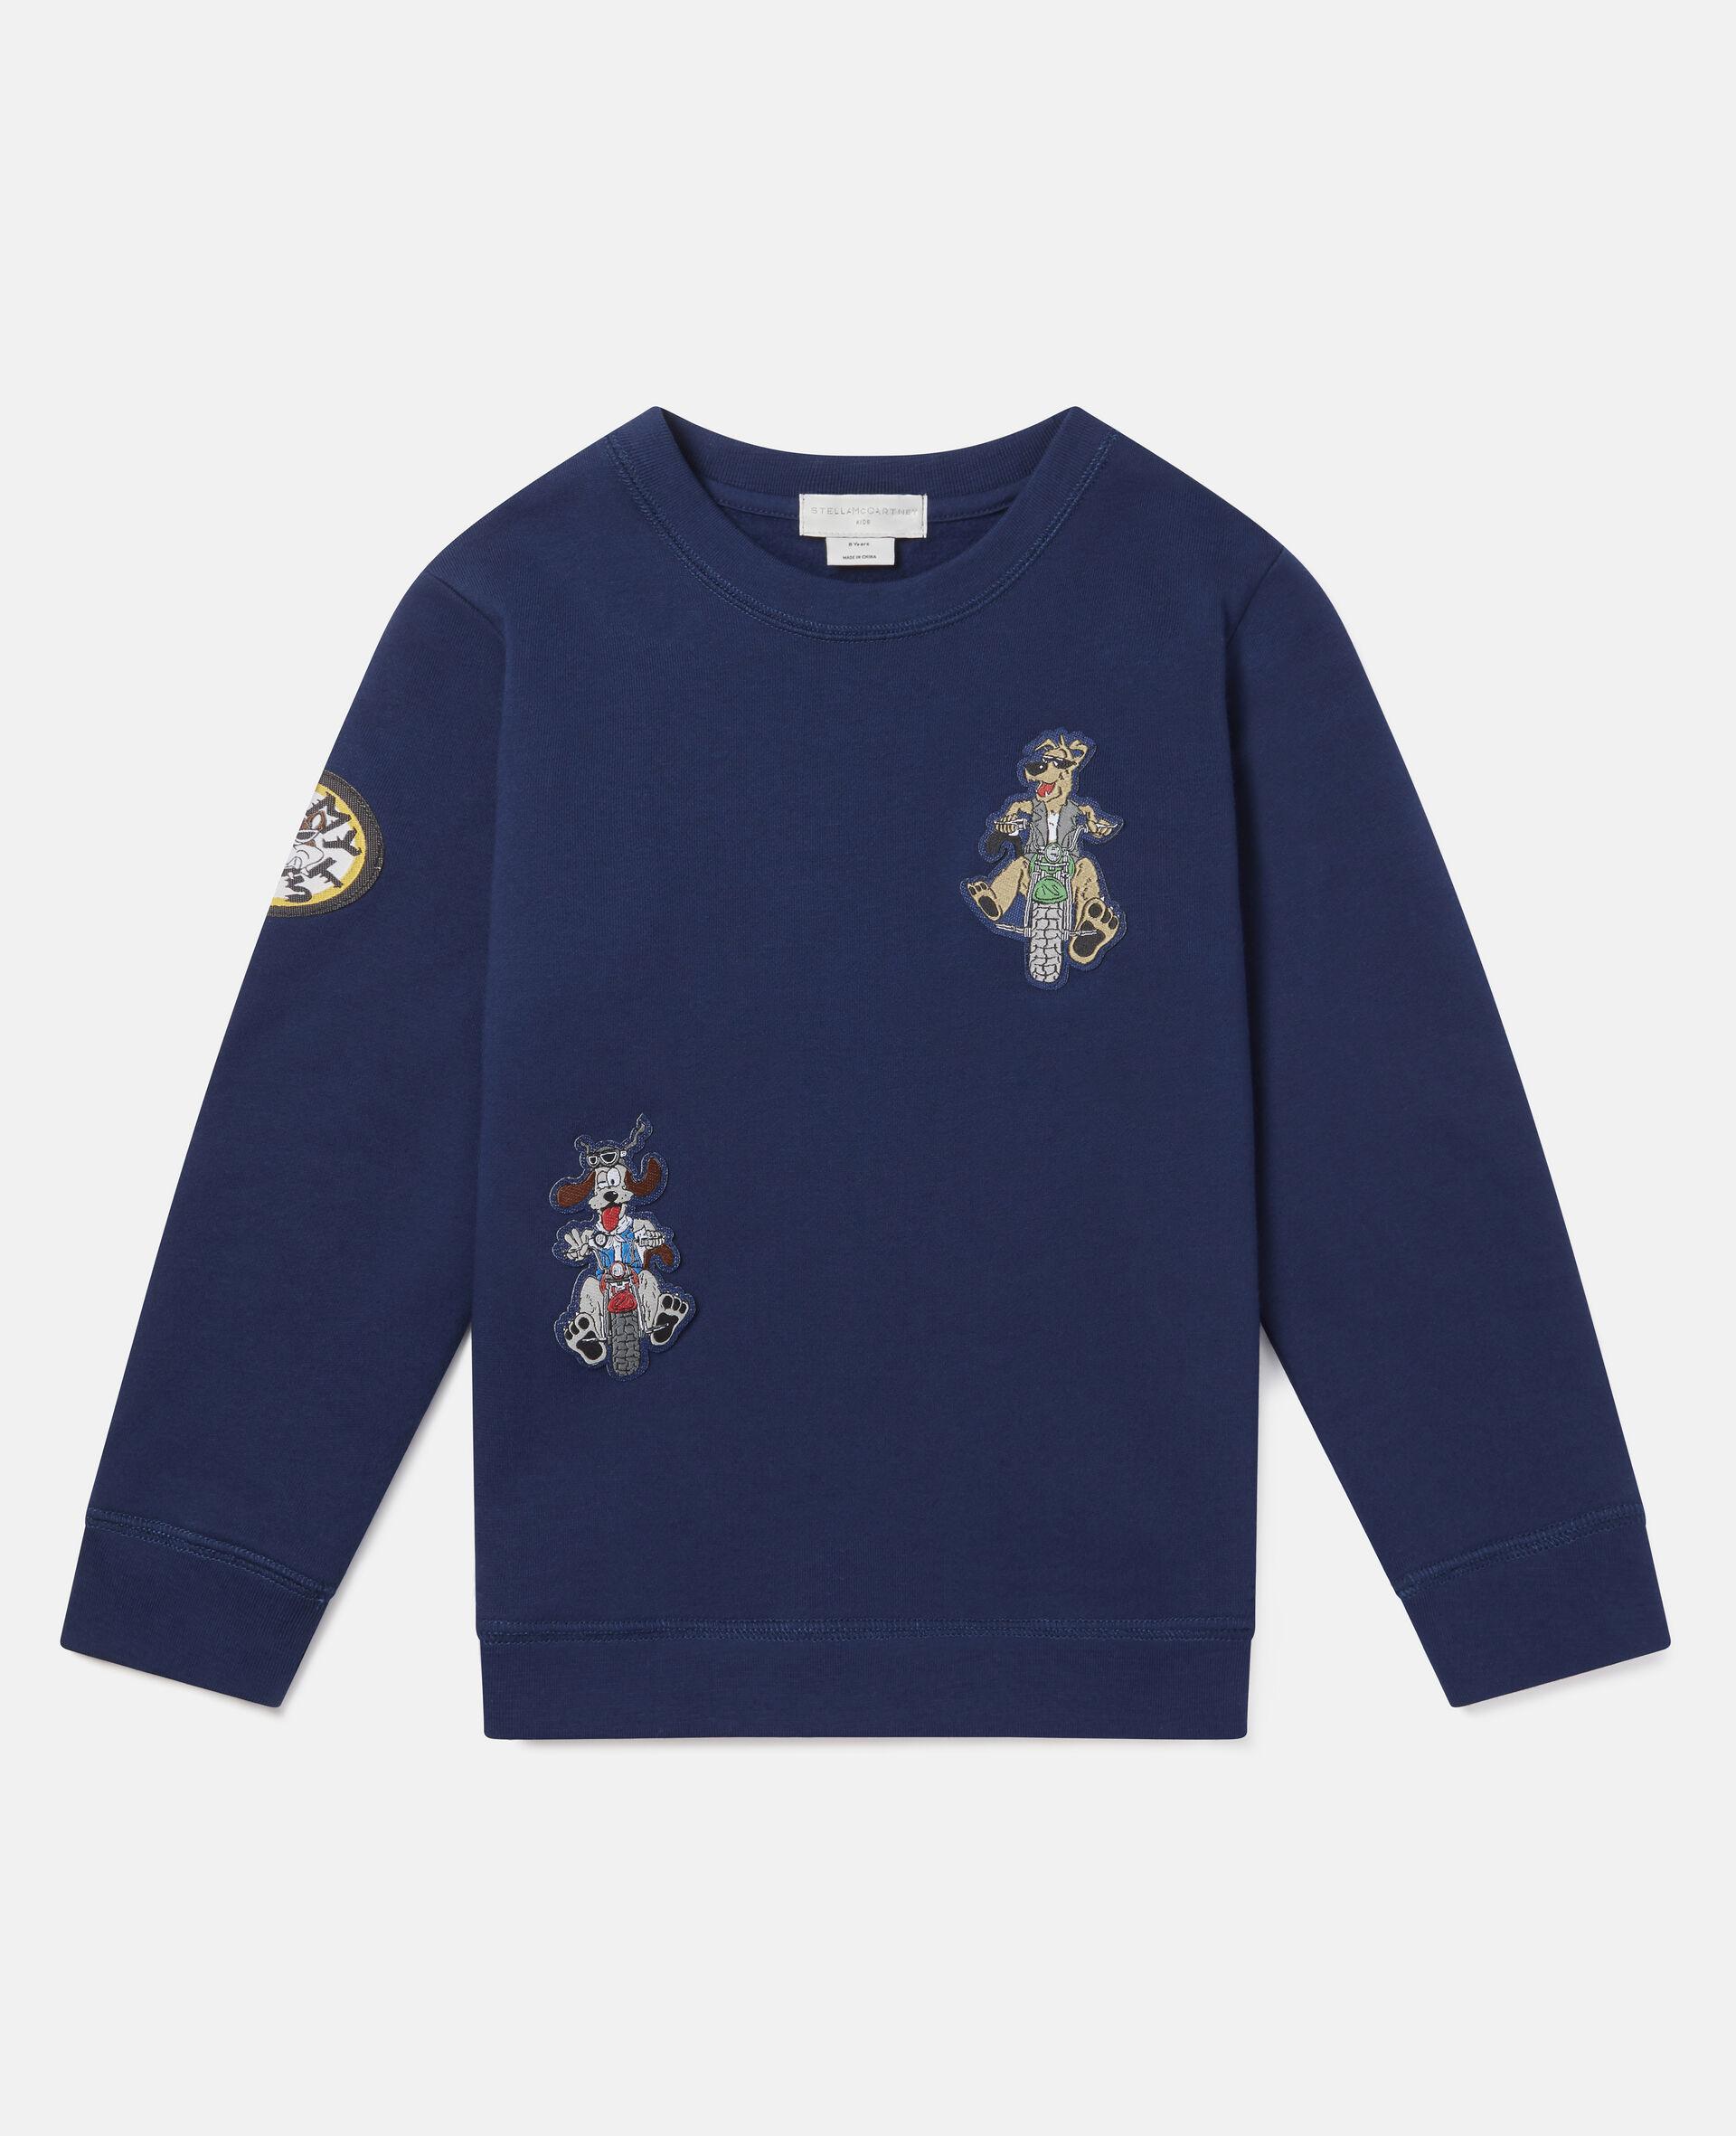 Doggie Riders Badges Fleece Sweatshirt-Blue-large image number 0